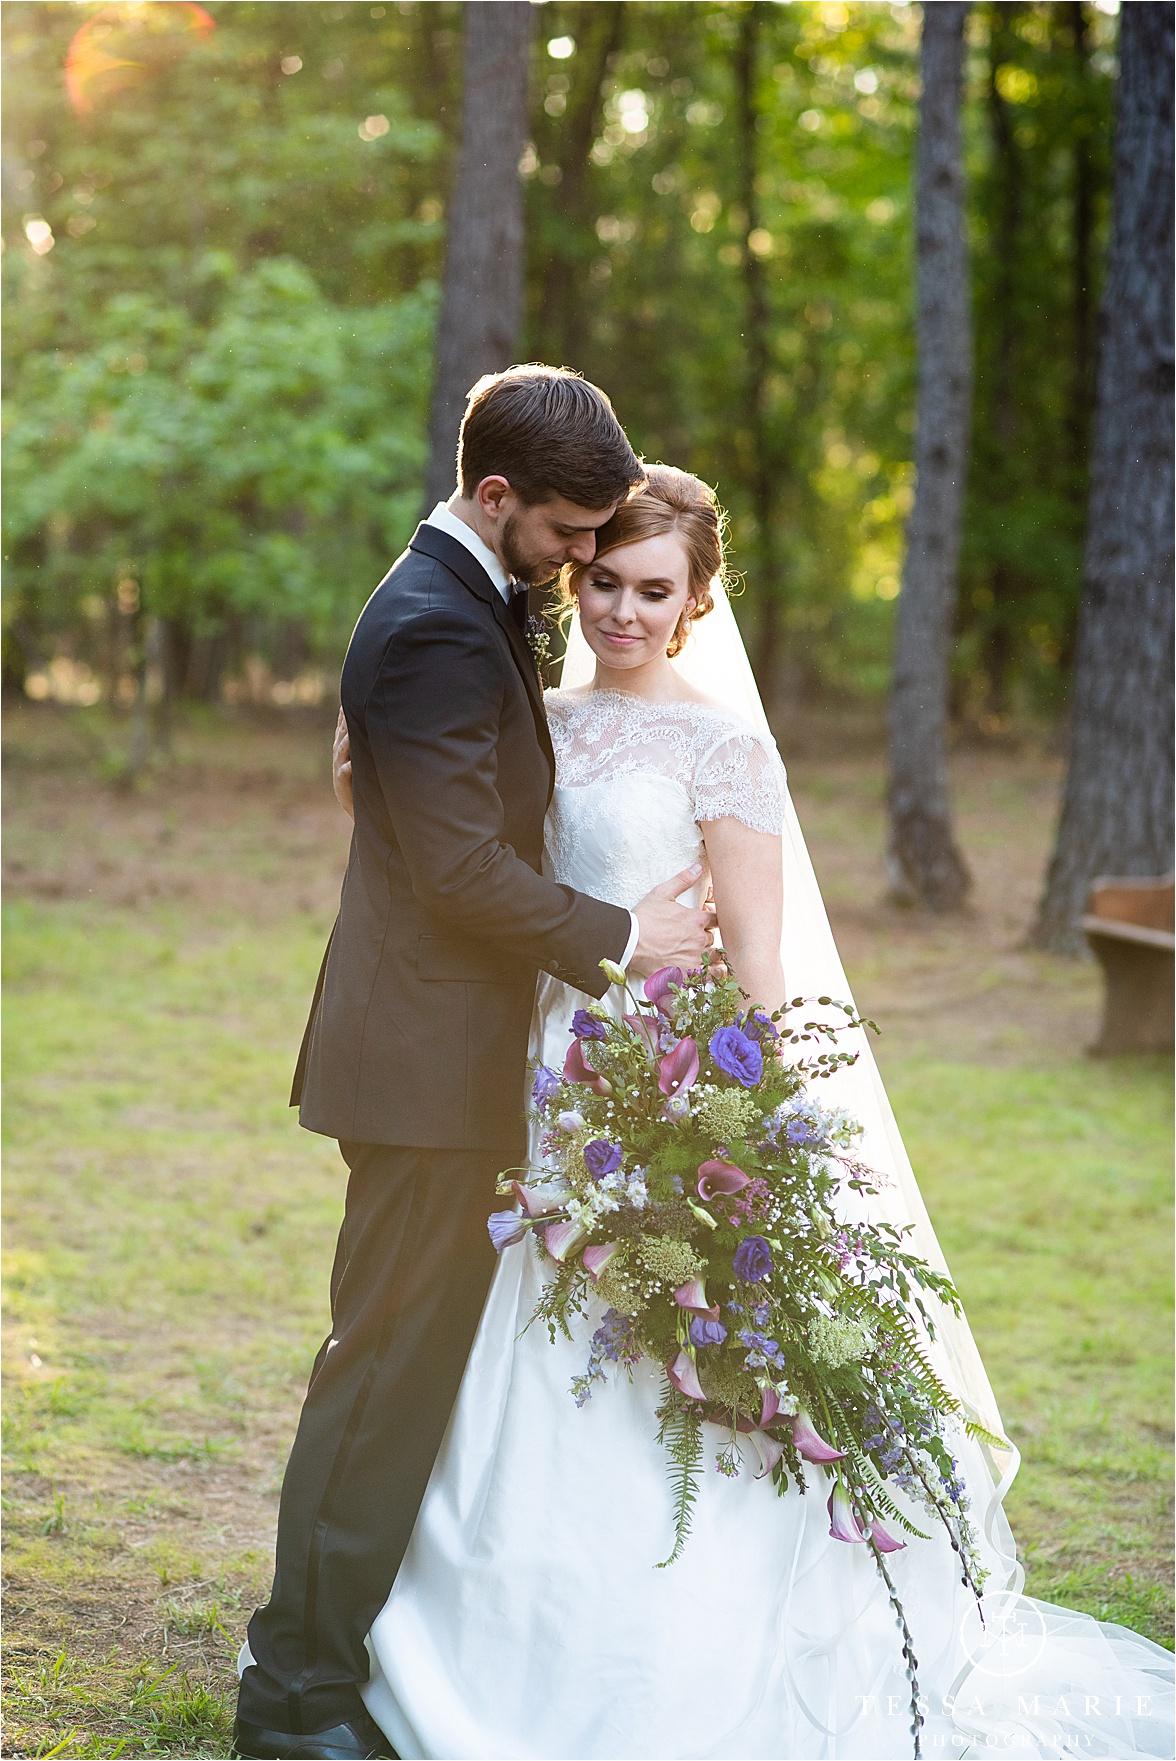 Tessa_marie_weddings_columbus_wedding_photographer_wedding_day_spring_outdoor_wedding_0114.jpg